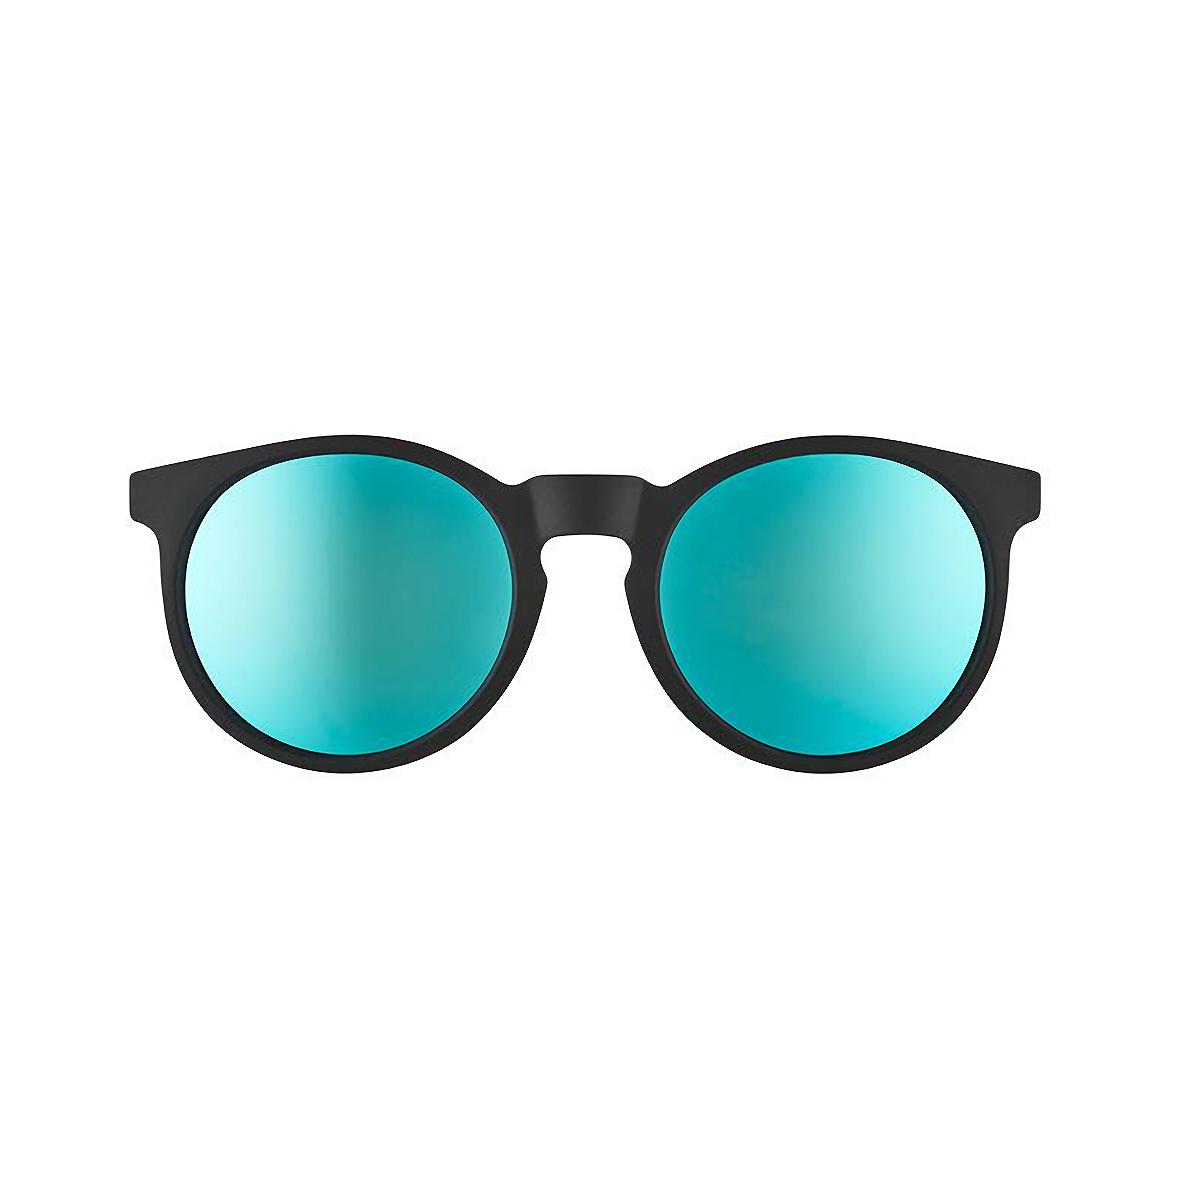 Goodr Midnight Ramble At Circle Bar Sunglasses - Color: Black - Size: OS, Black, large, image 2